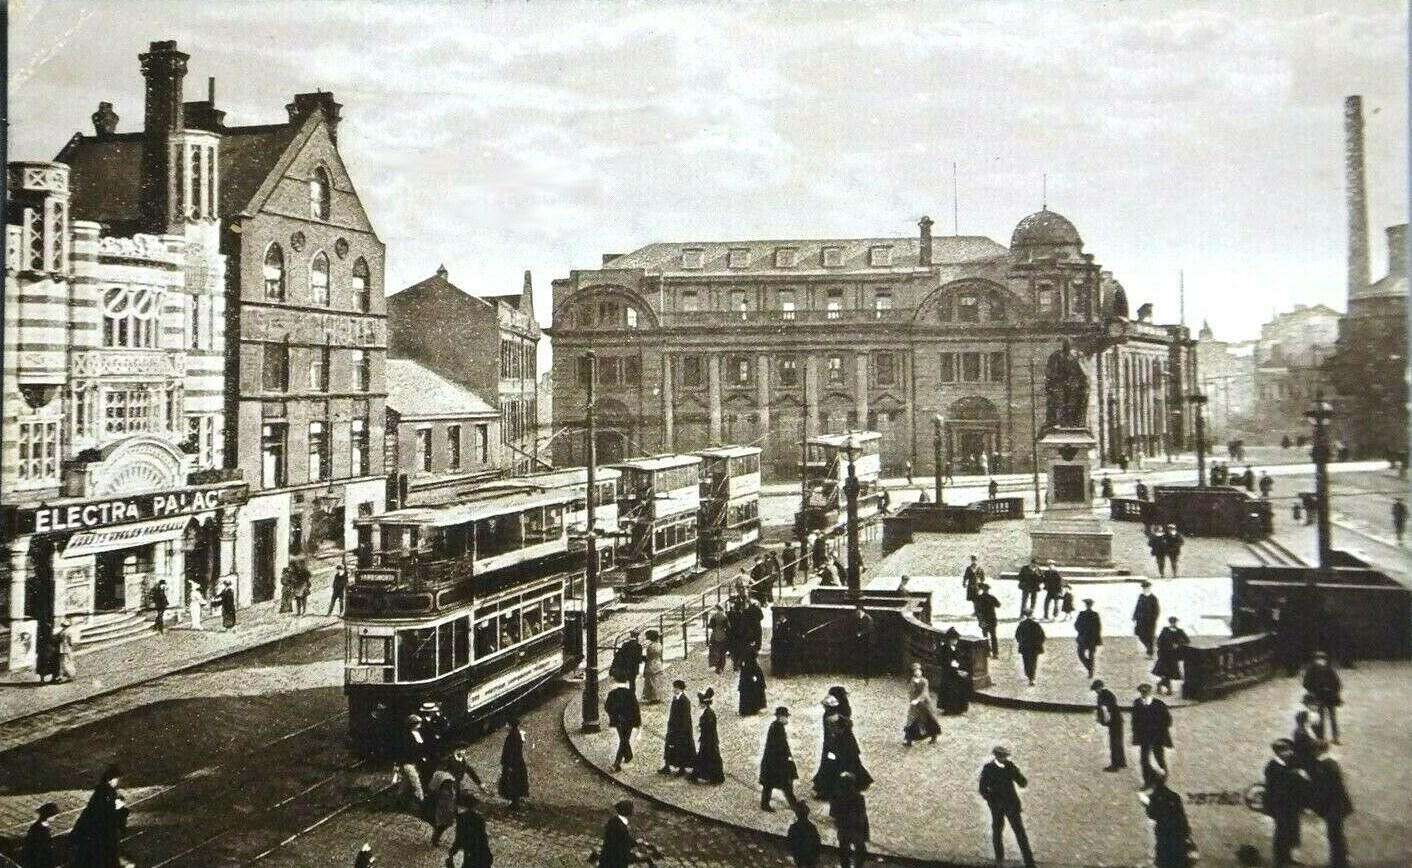 fitzalan_square_trams_electra_palace_1925.jpg